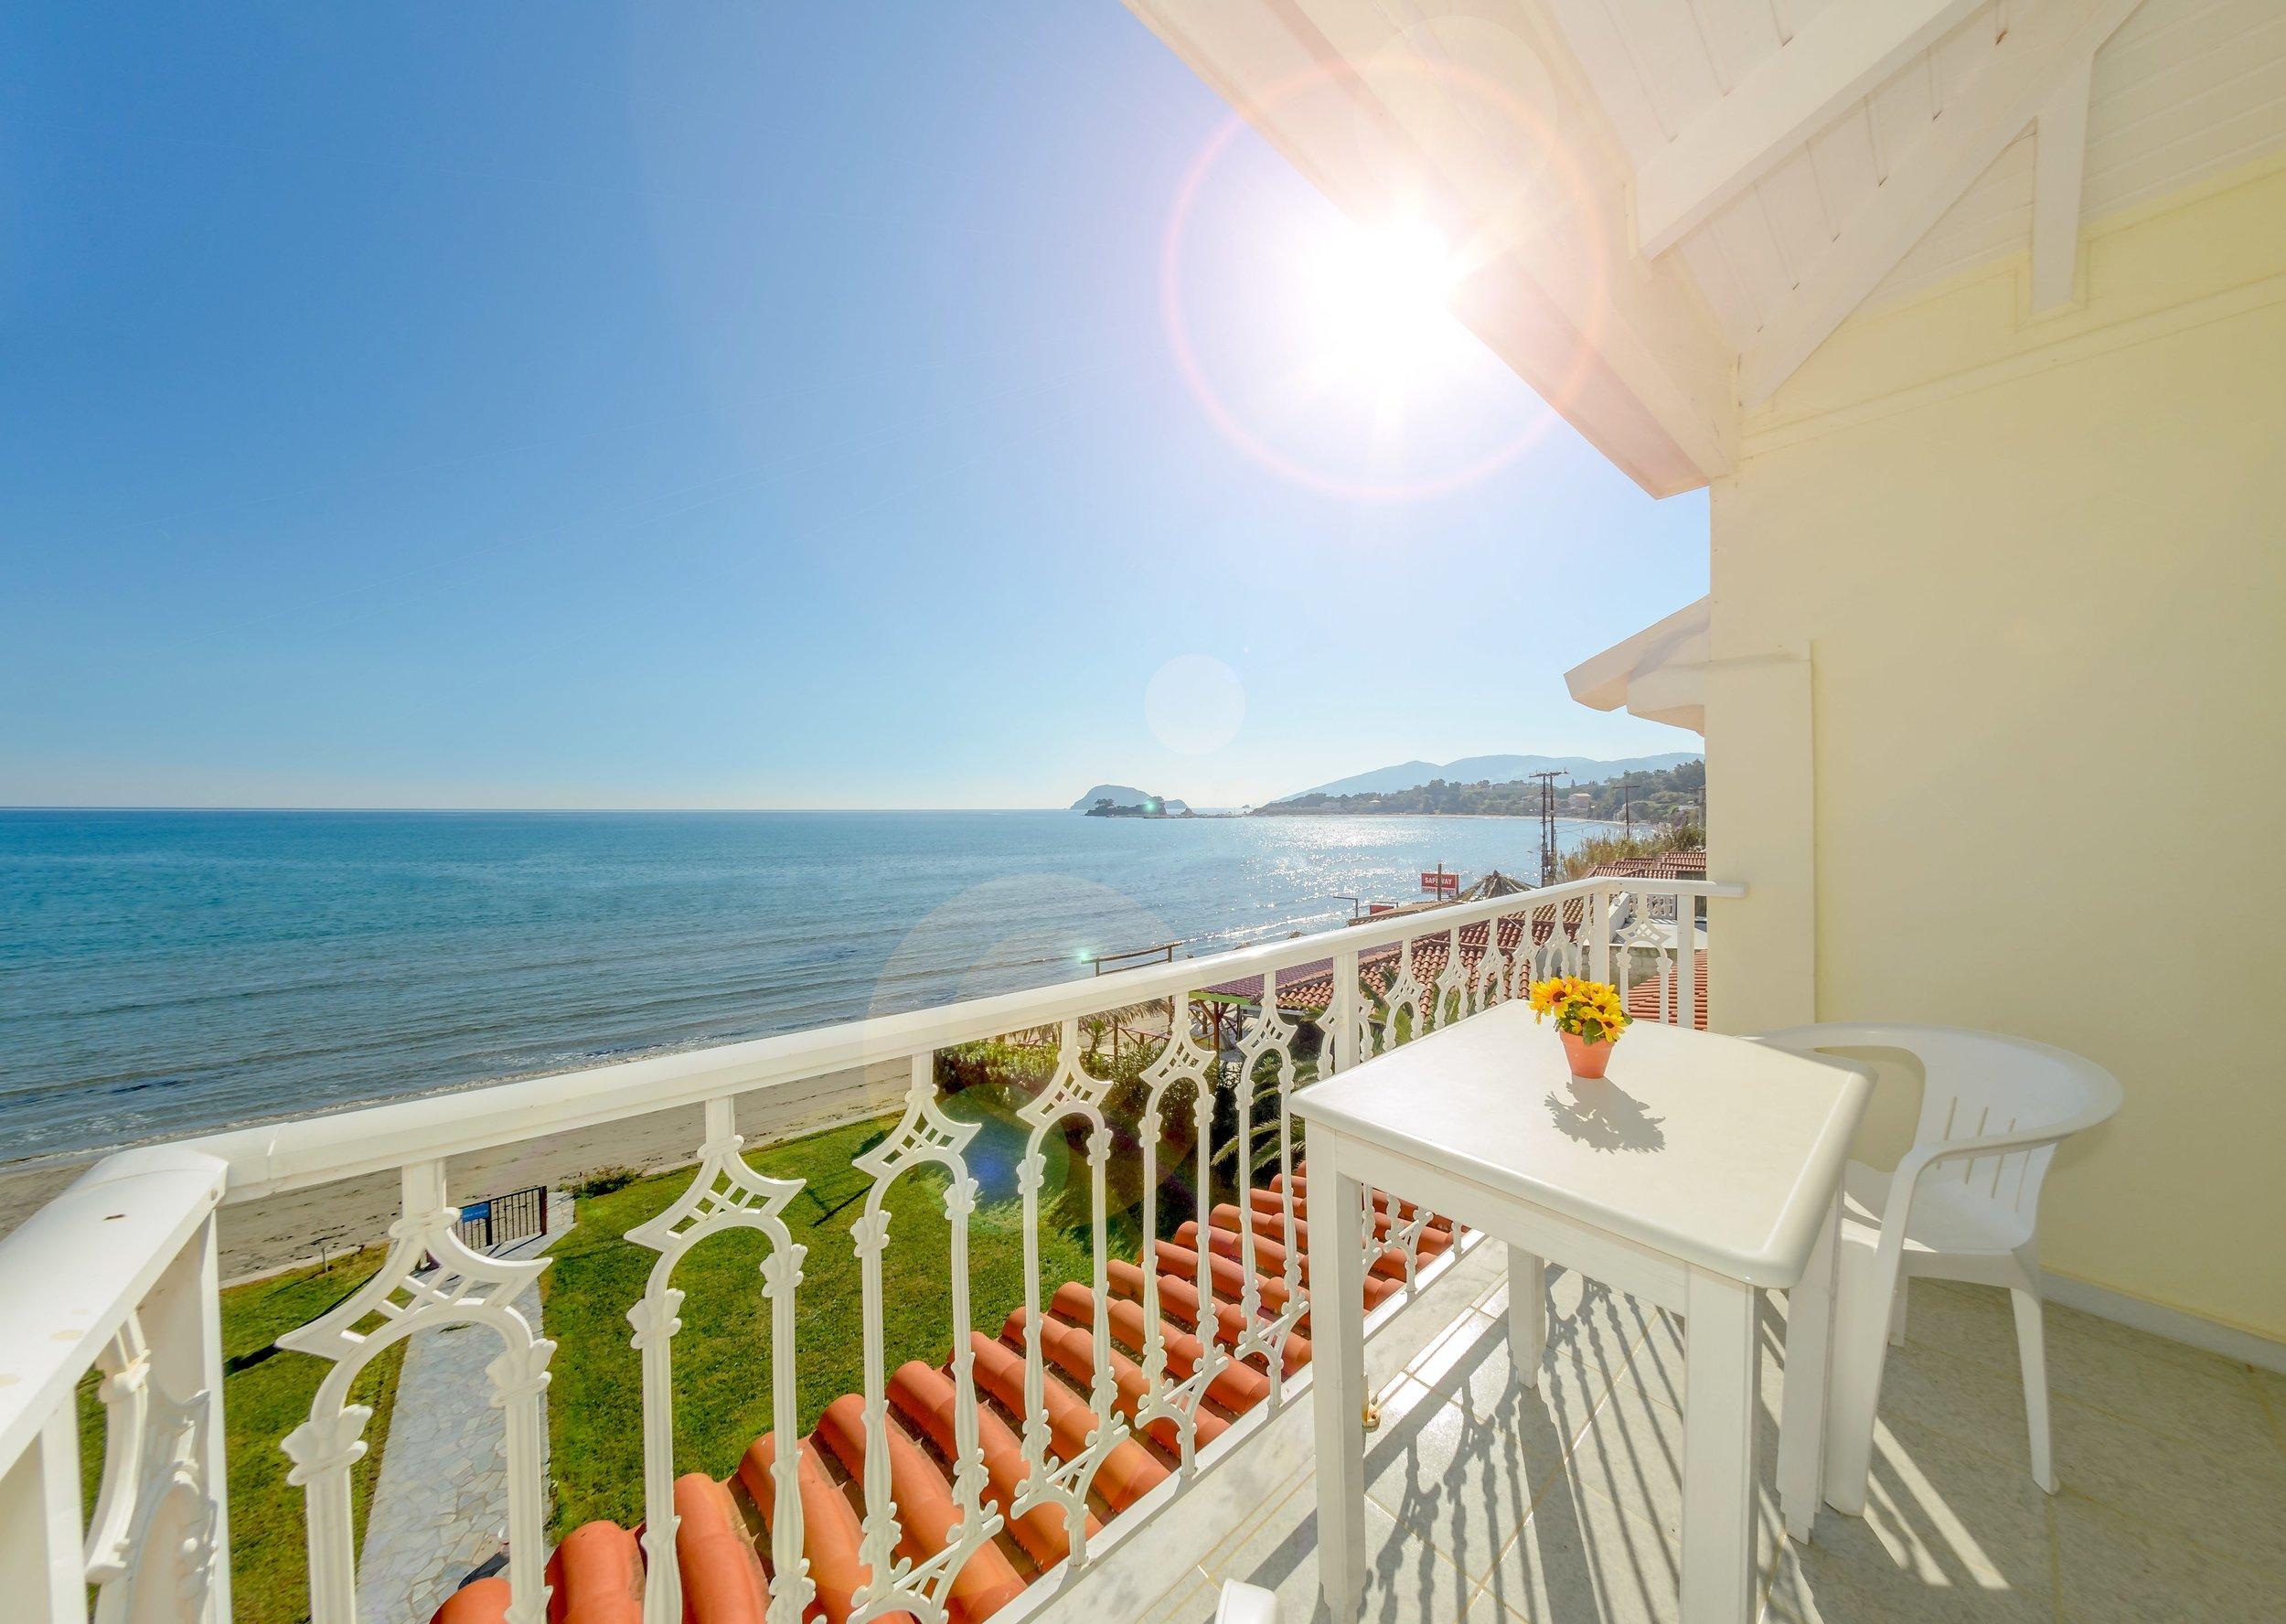 balcony-1-min.jpg